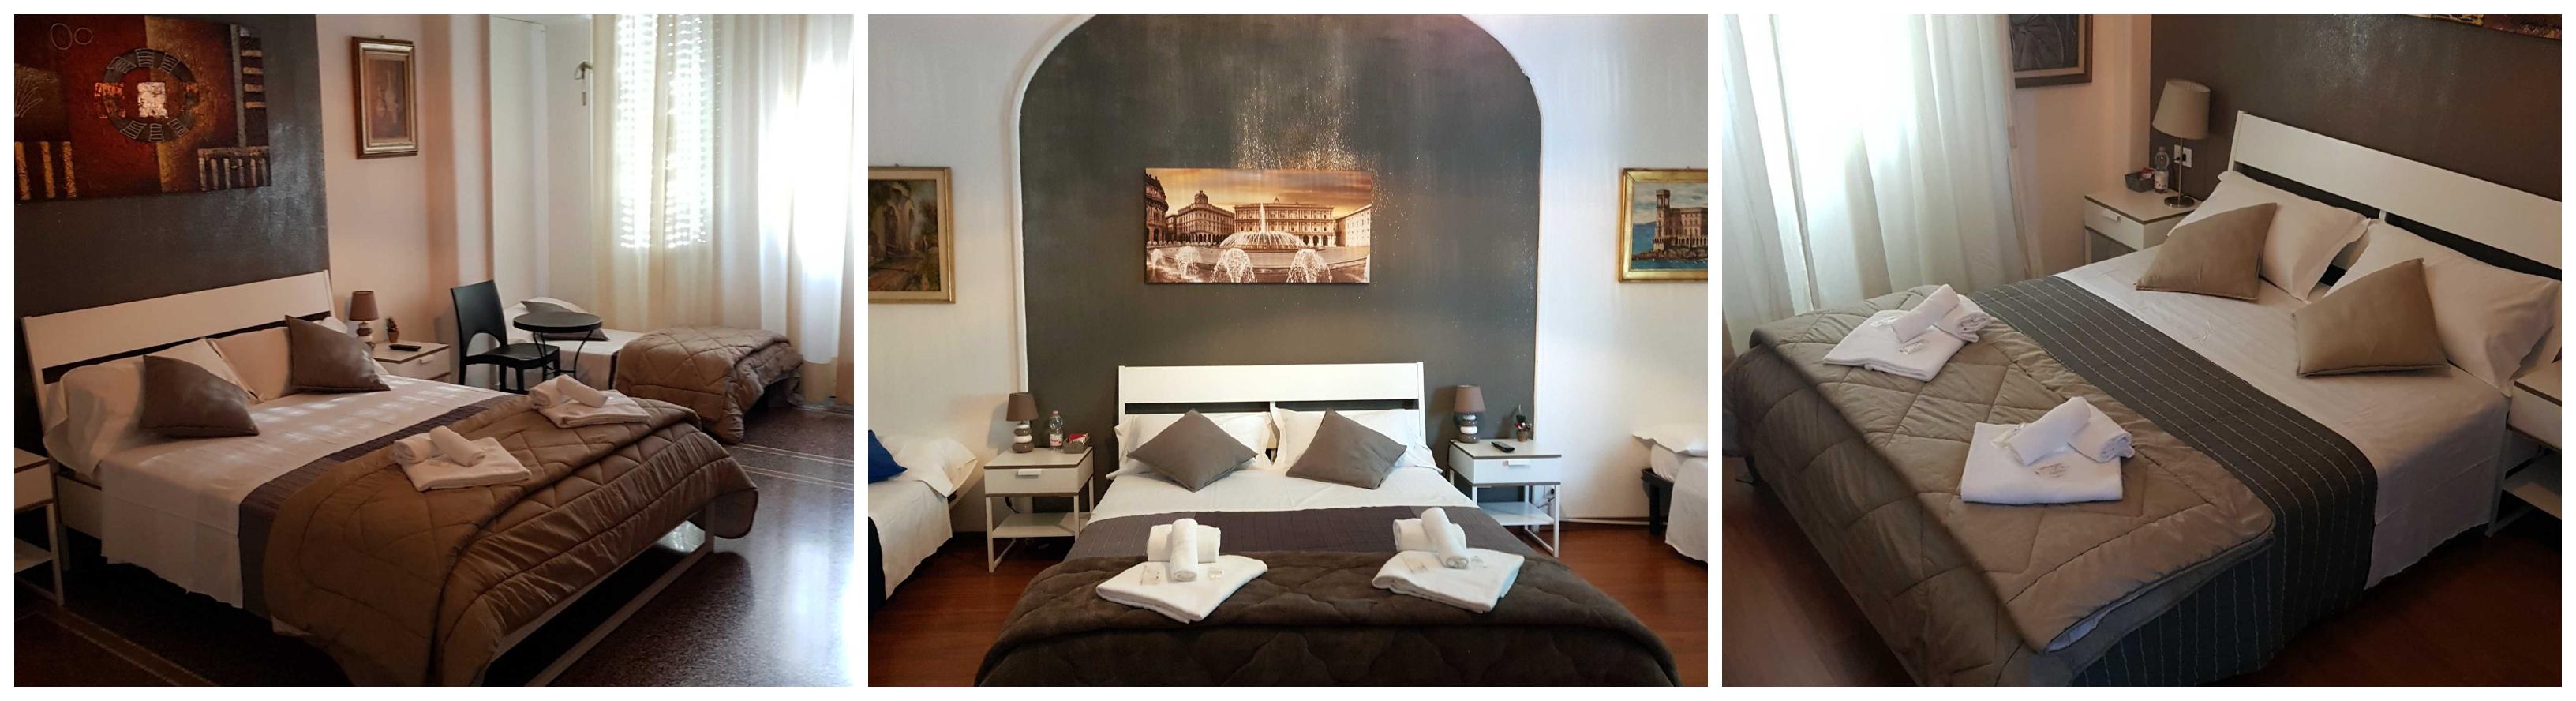 Central Rooms Genova Homepage